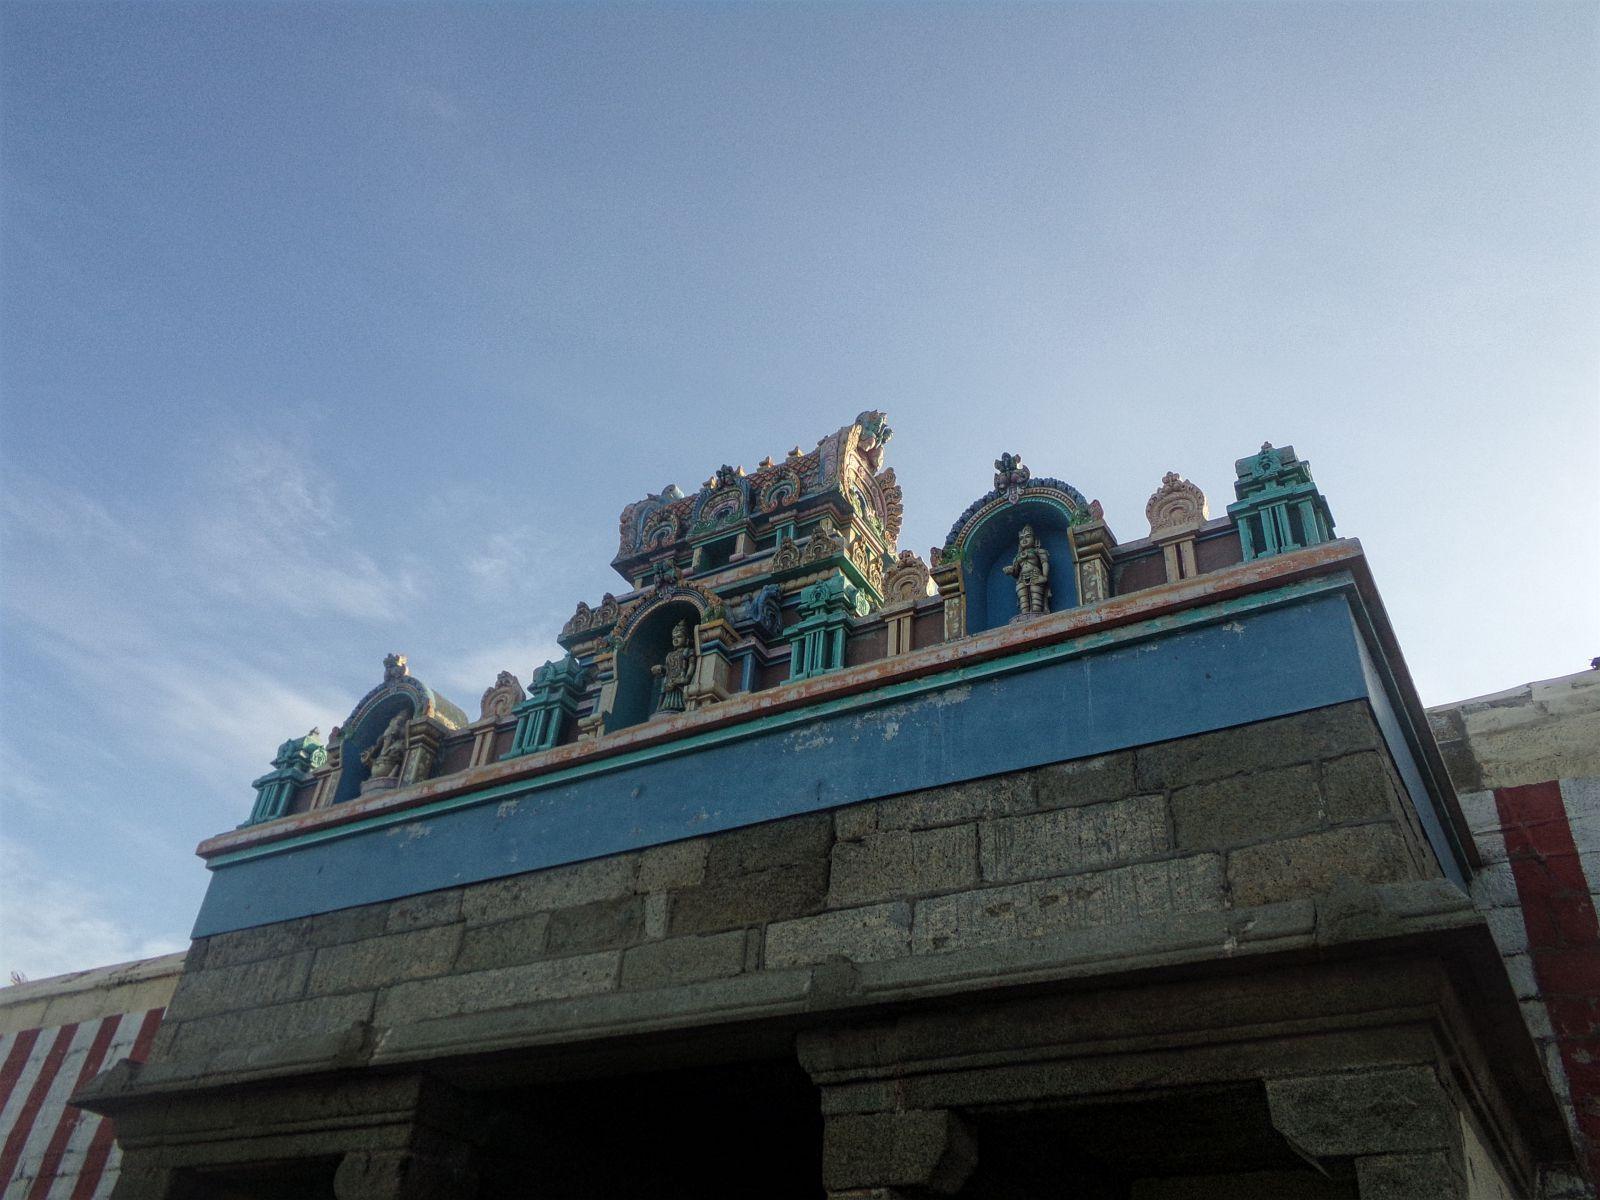 temple tamil kanyakumari inde du sud voyage